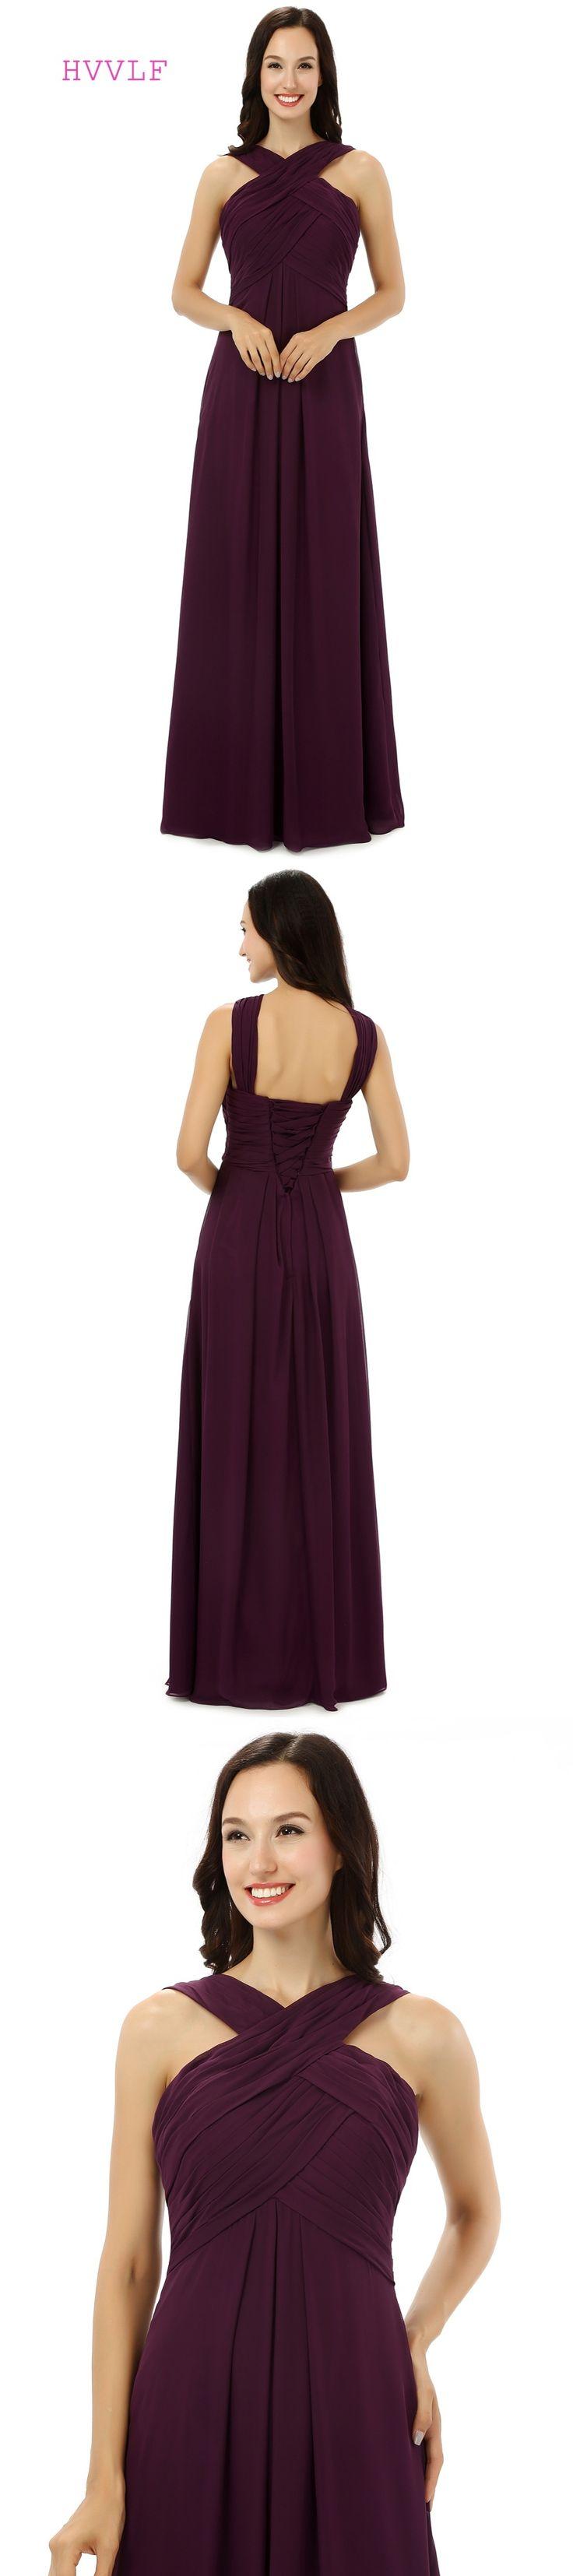 144 best bridesmaid dresses images on pinterest bridesmaids cheap 2018 bridesmaid dresses under 50 a line halter floor length chiffon pleated purple long ombrellifo Choice Image